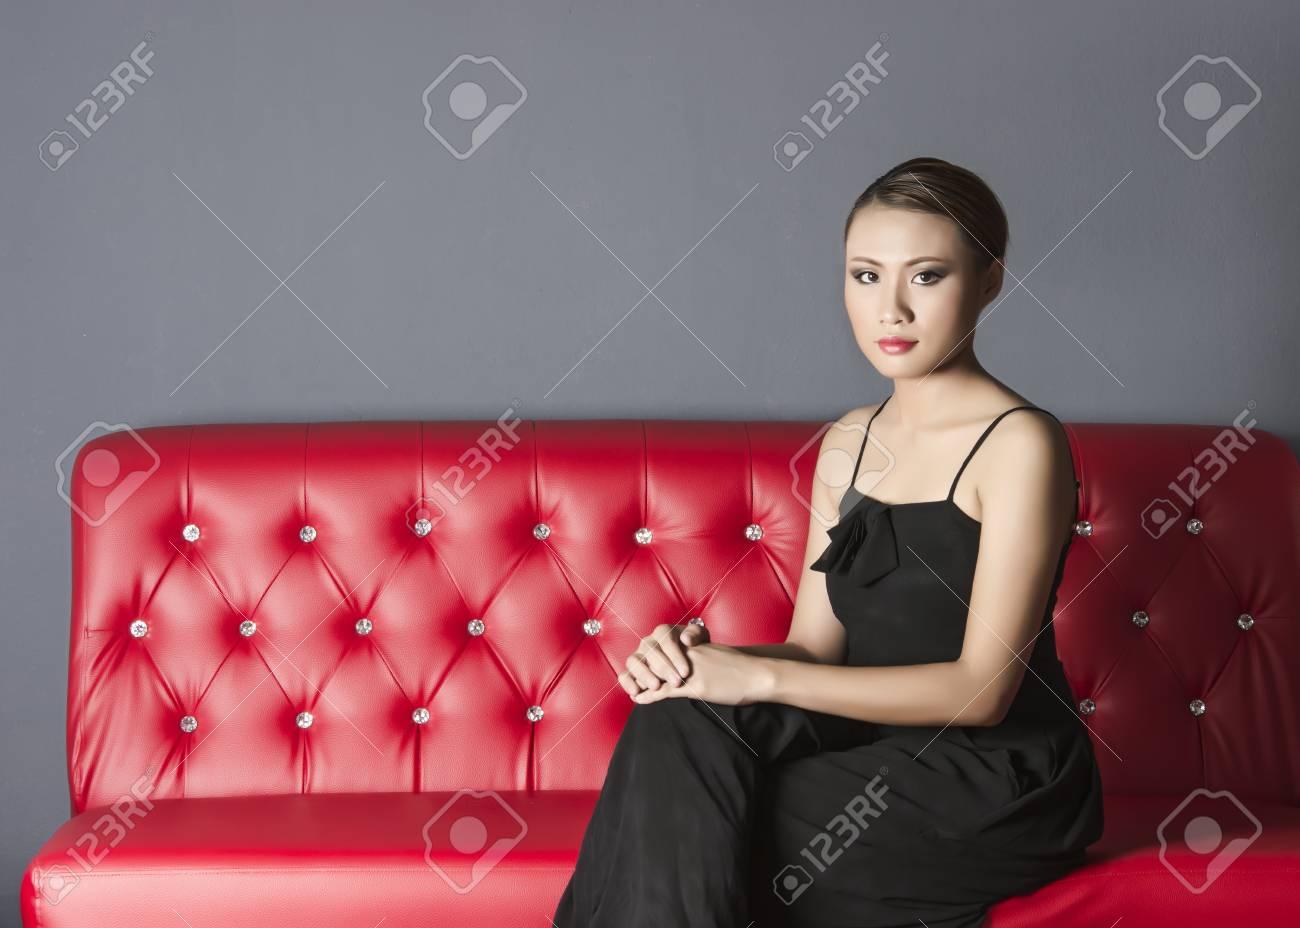 Beautiful woman in black dress sitting on red sofa